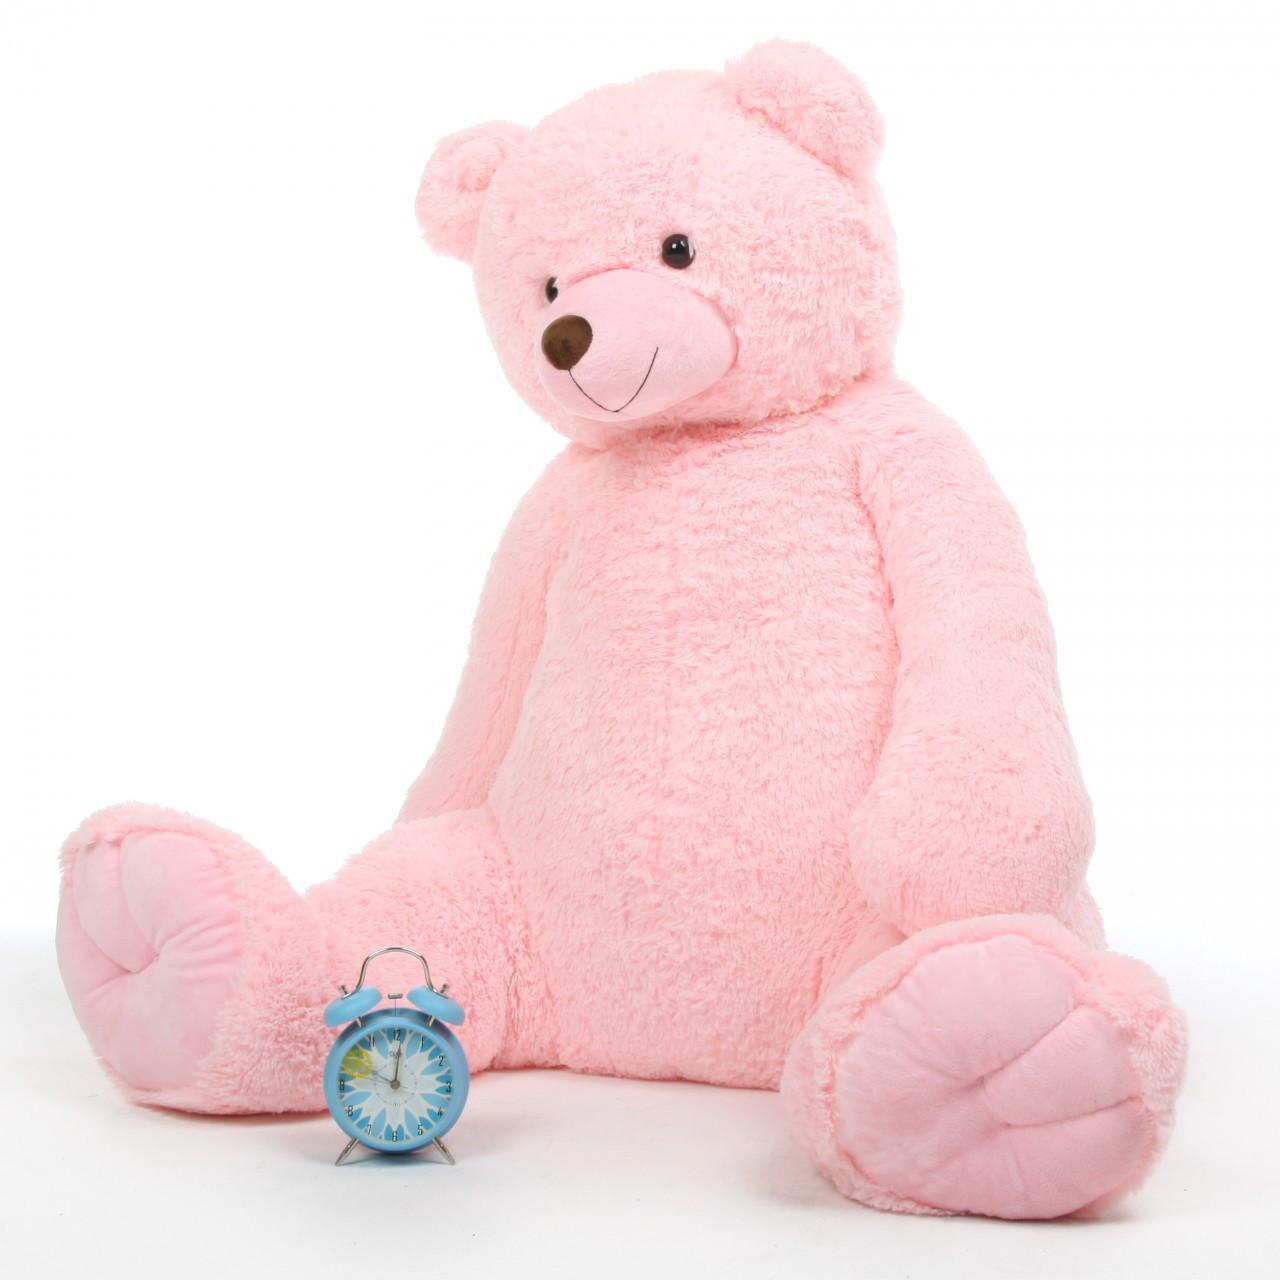 Darling Tubs 52 Pink Huge Stuffed Teddy Bear Giant